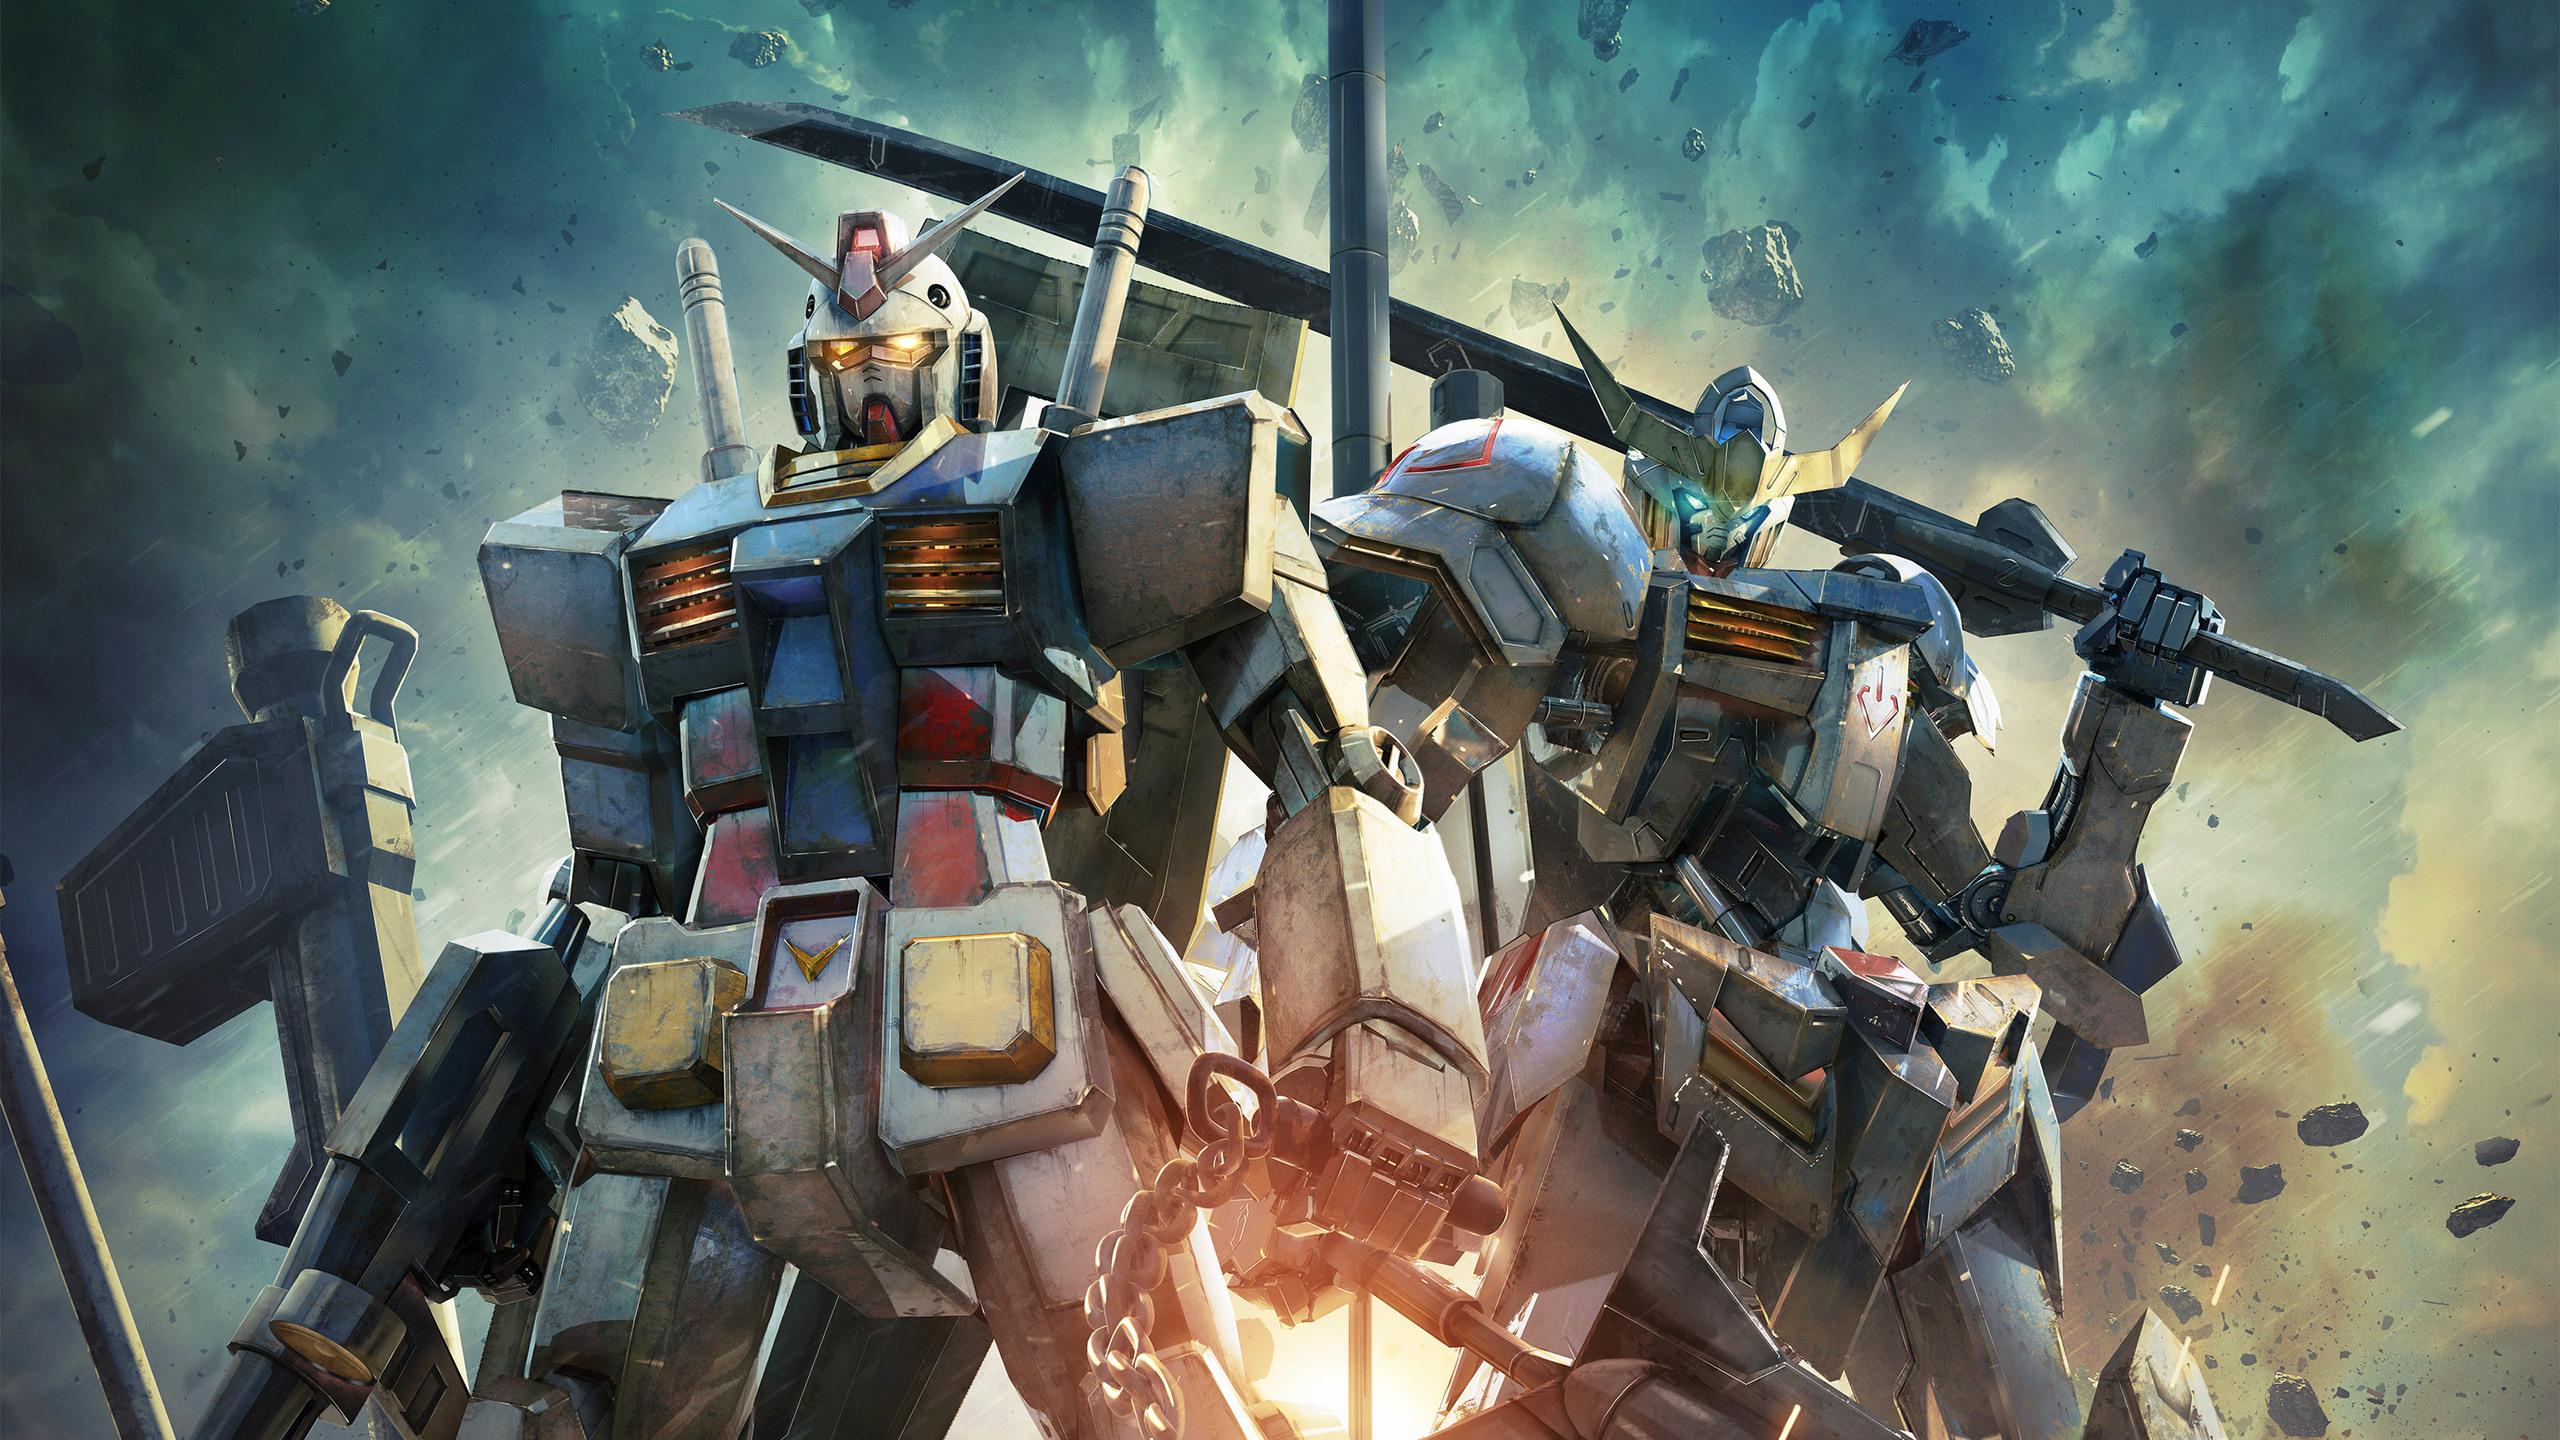 2560x1440 gundam versus 2017 1440p resolution hd 4k wallpapers images backgrounds photos and - Gundam wallpaper hd ...